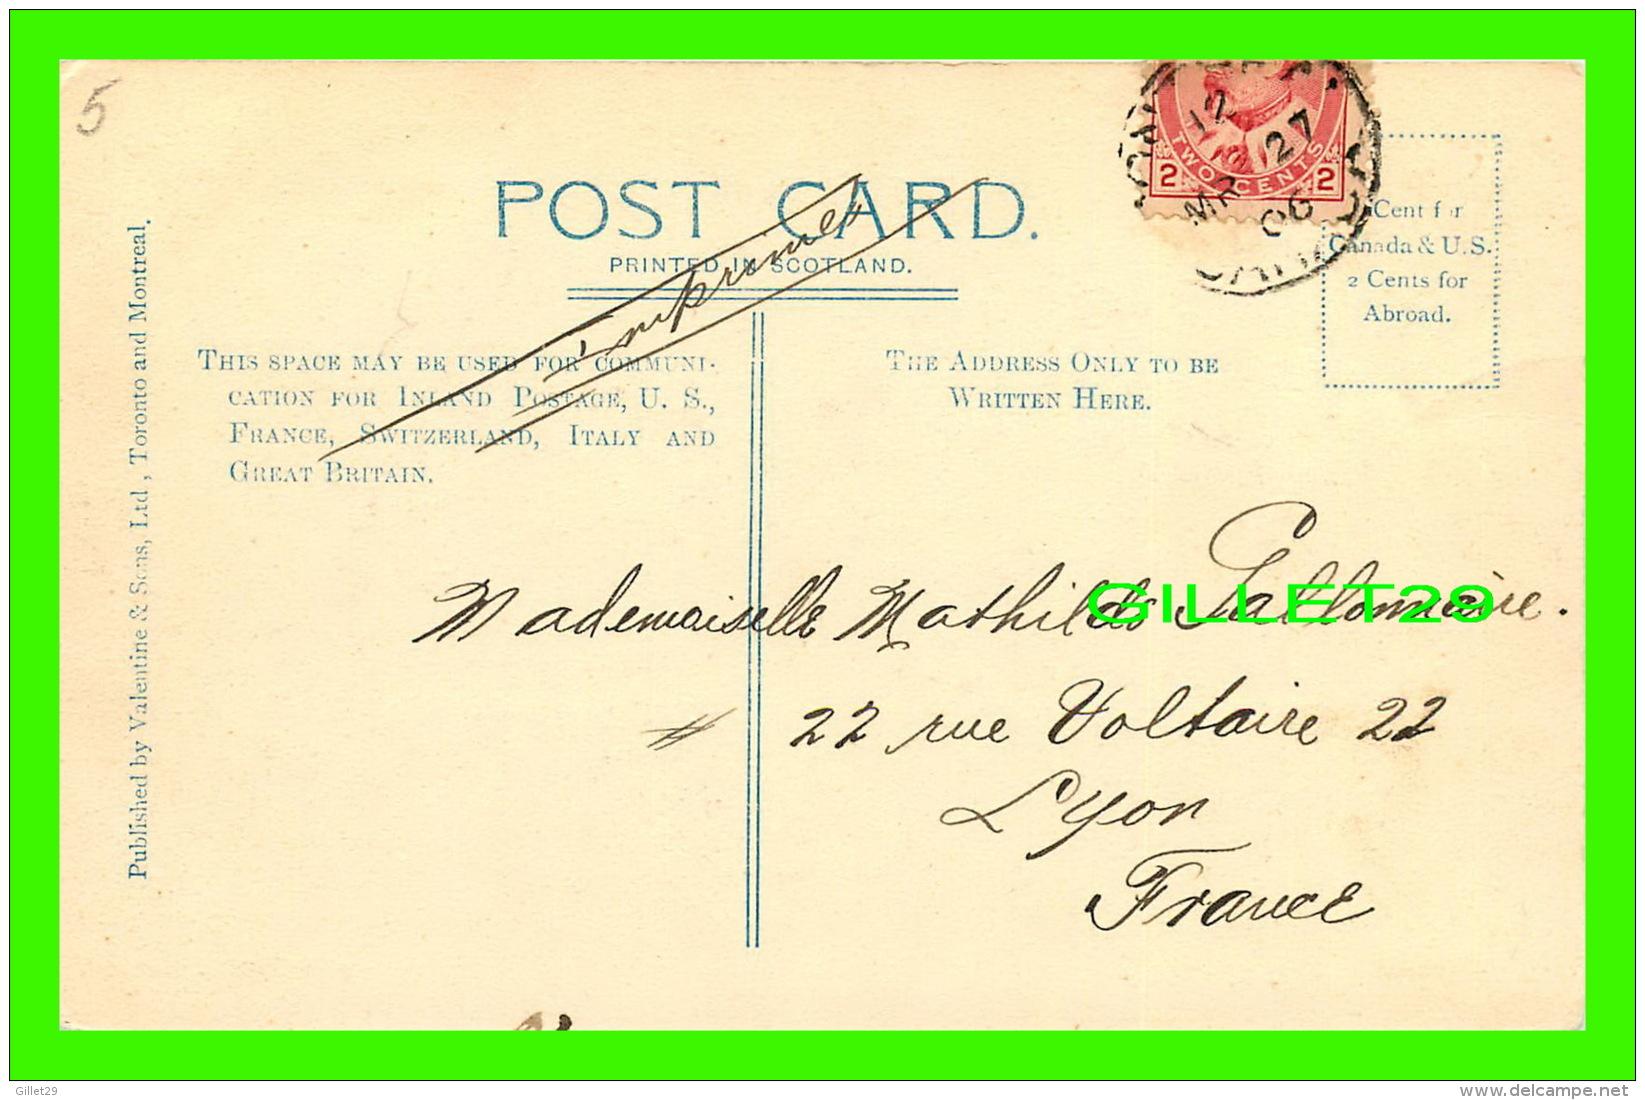 BUCKINGHAM, QUÉBEC - BUCKINGHAM FALLS - CANADIAN PACIFIC RAILWAY - CIRCULÉE EN 1906 -  VALENTINE AND SONS LTD - - Autres